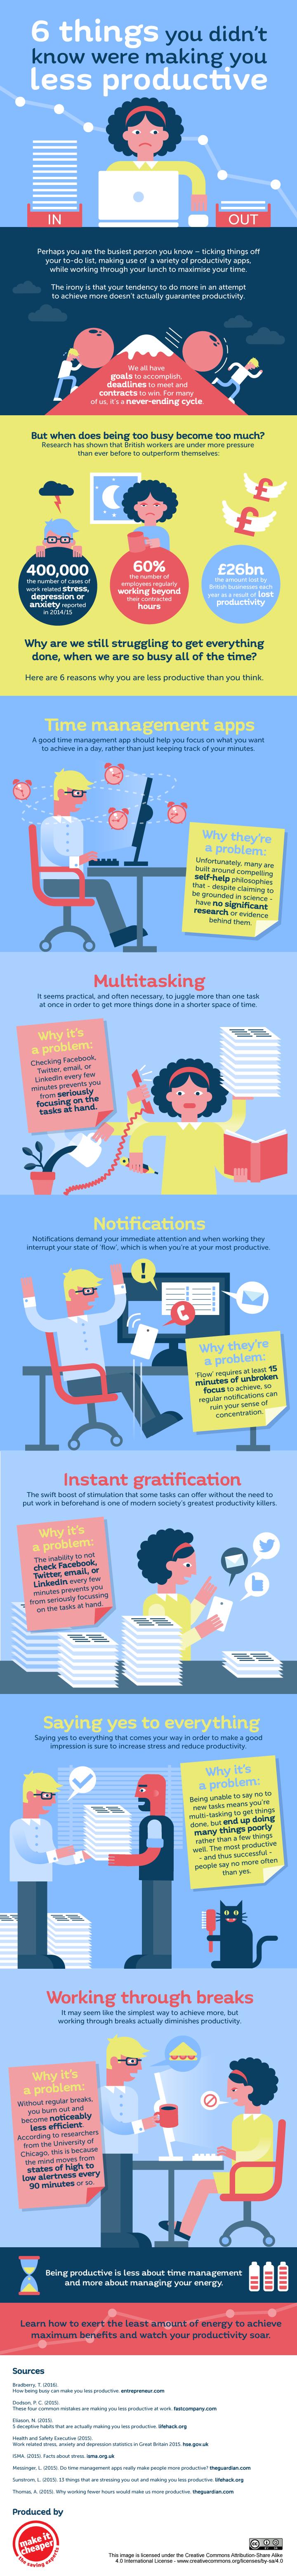 productivity tips for promo distributors